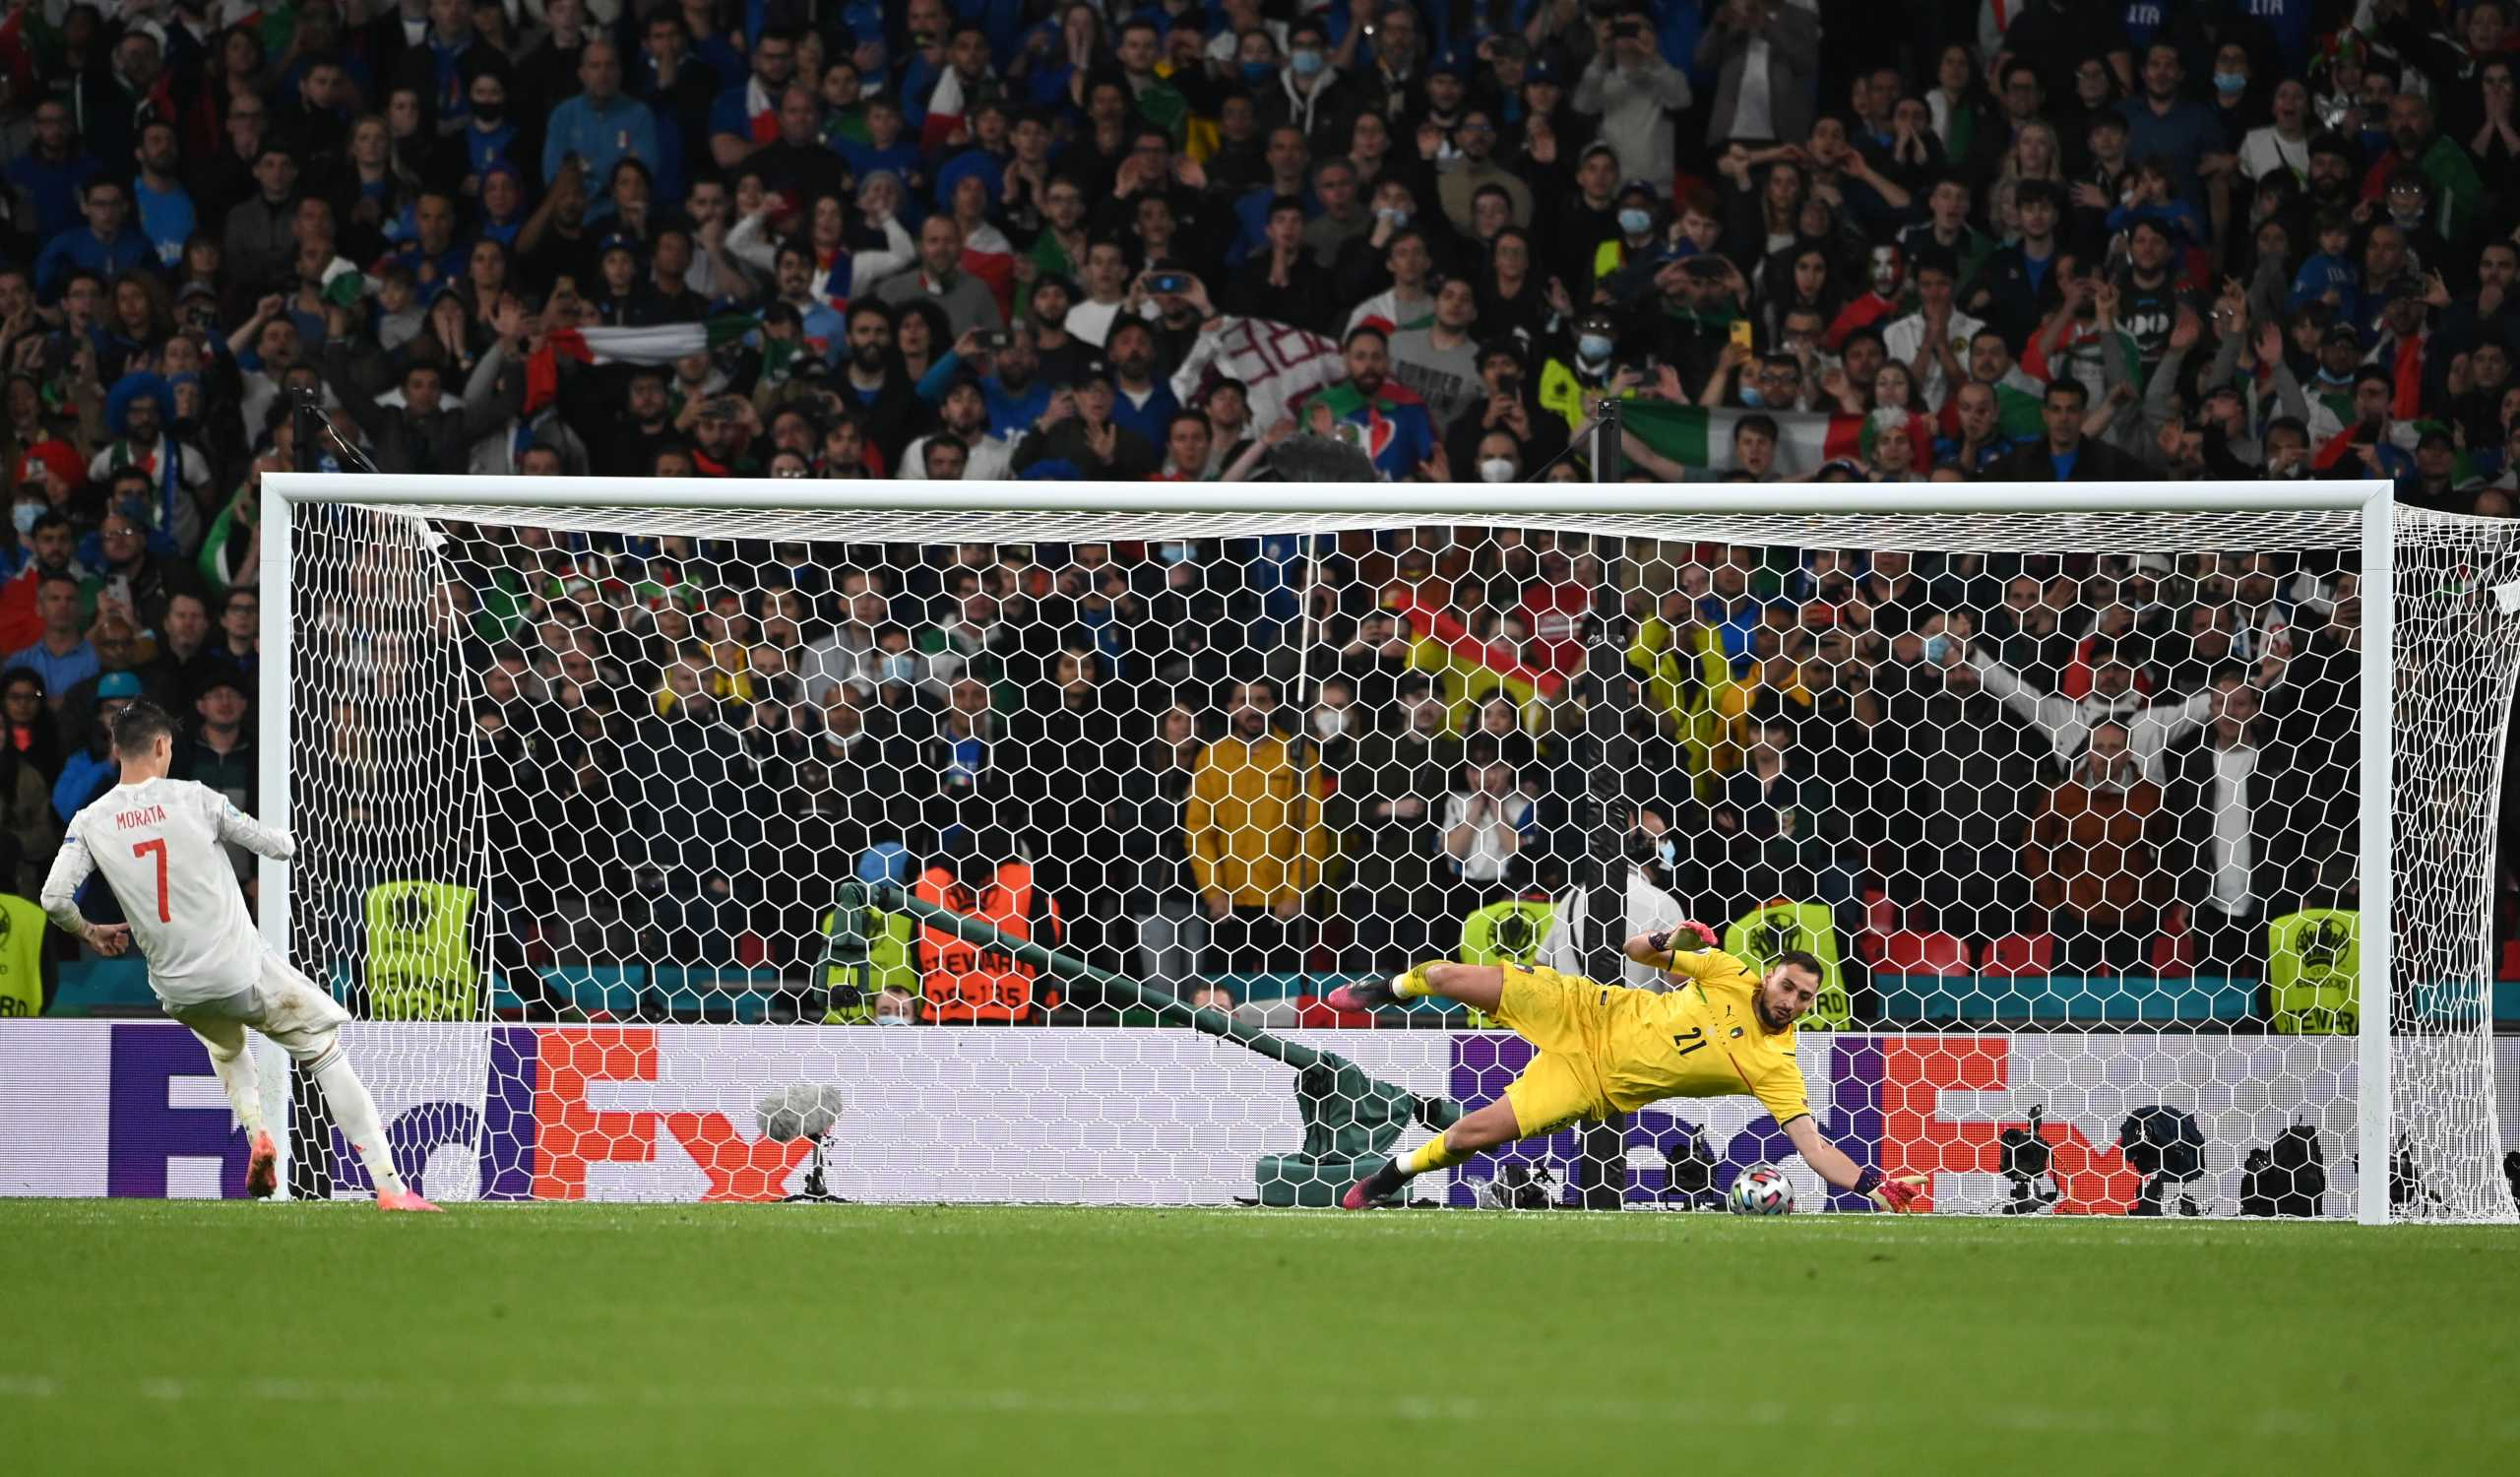 Euro 2020, Ιταλία – Ισπανία : Ντοναρούμα, Ζορζίνιο και τελικός